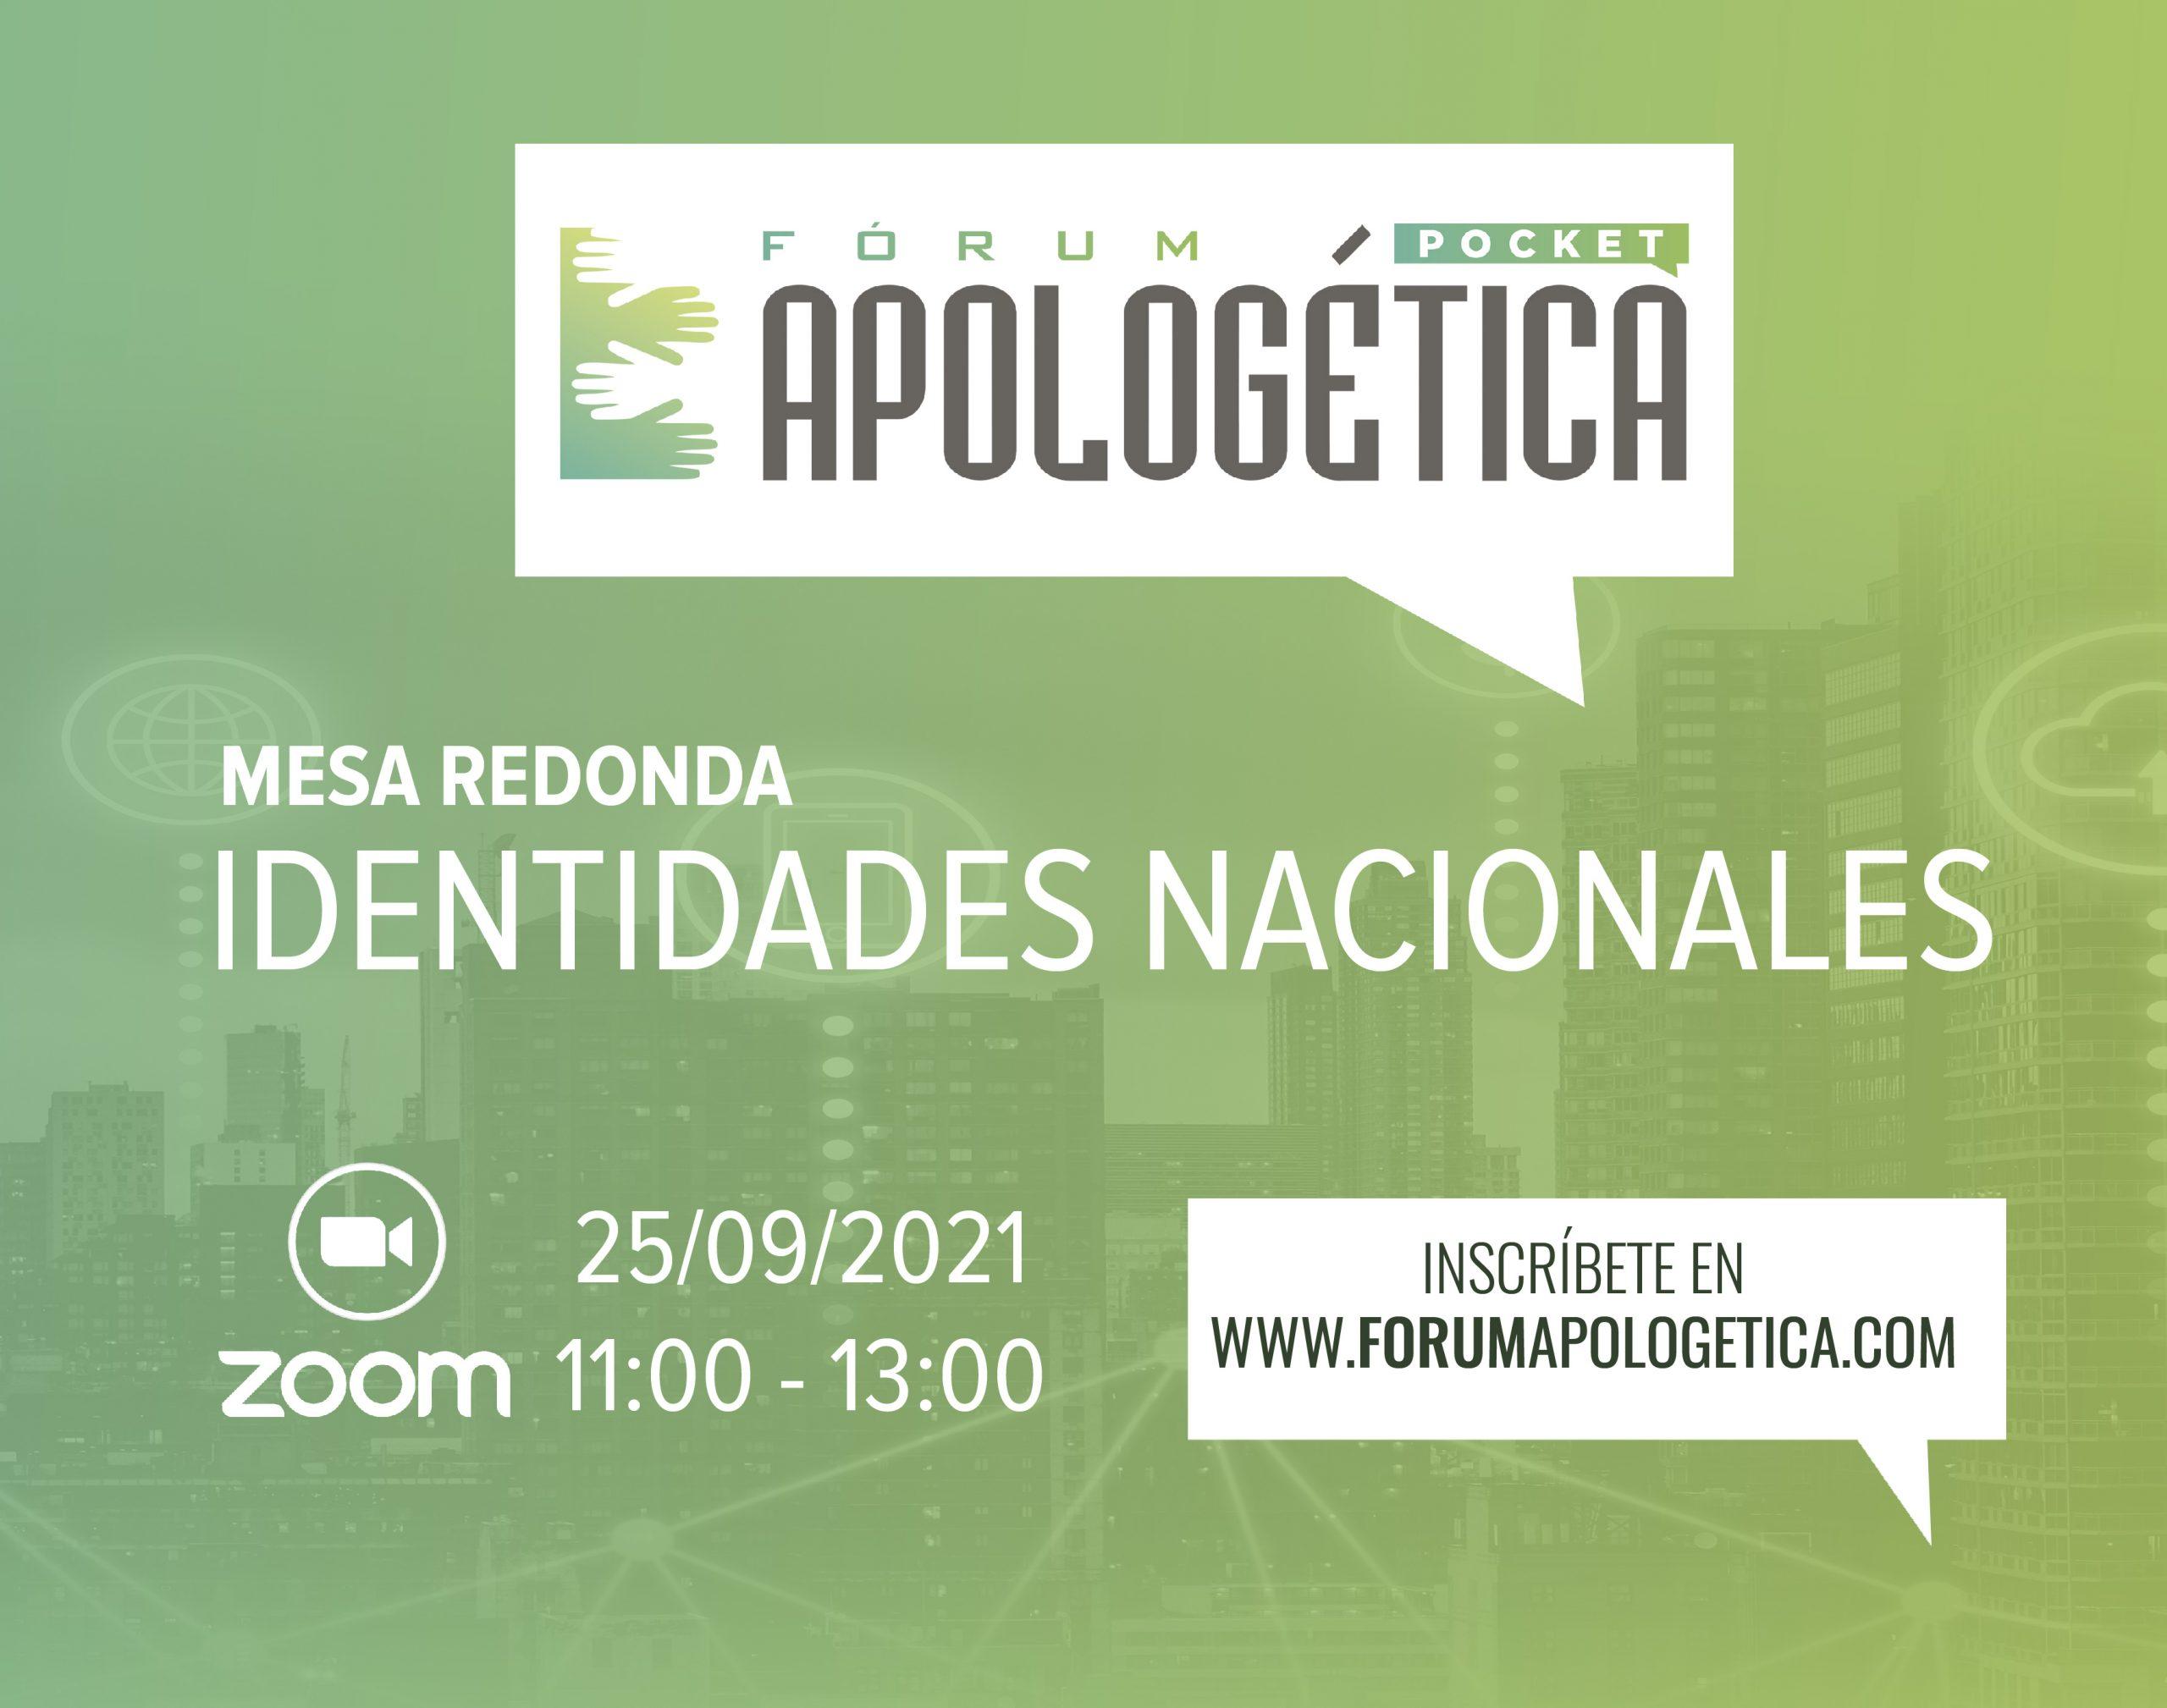 Forum apologetica pocket